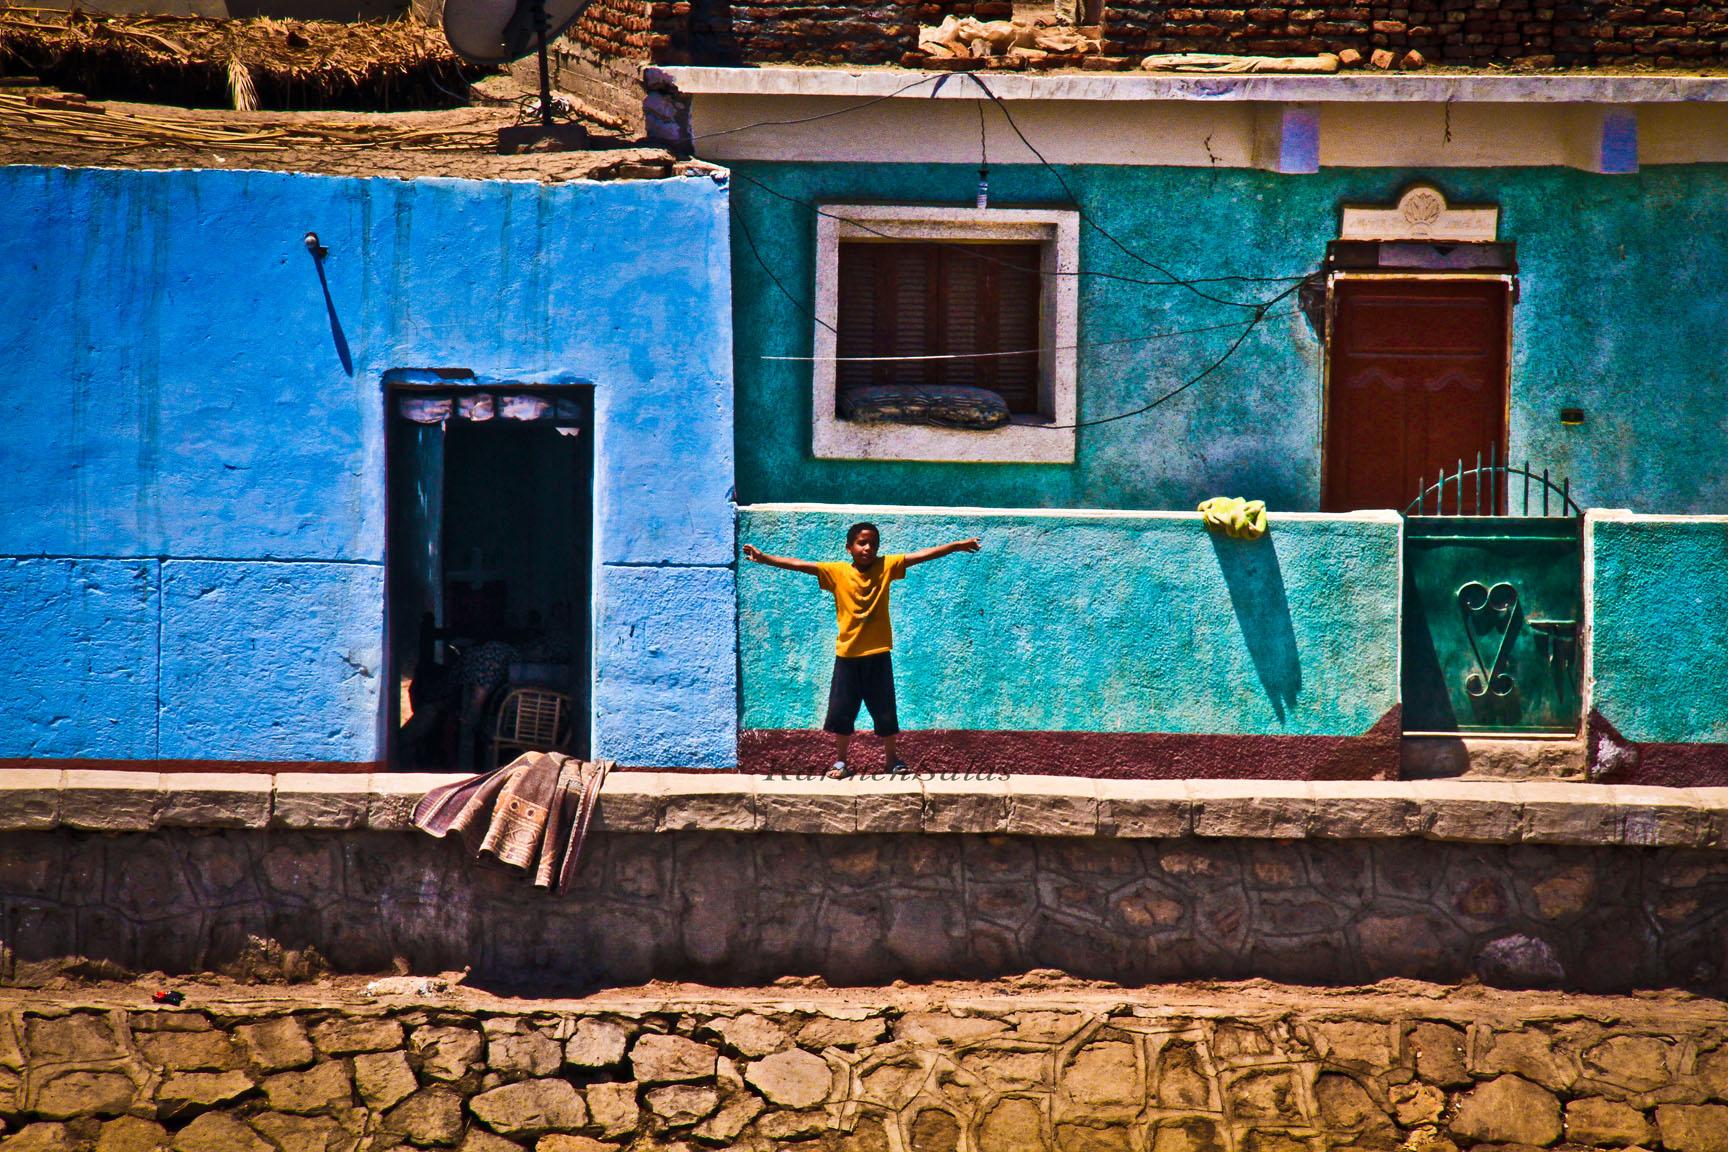 Casas a orillas del Nilo